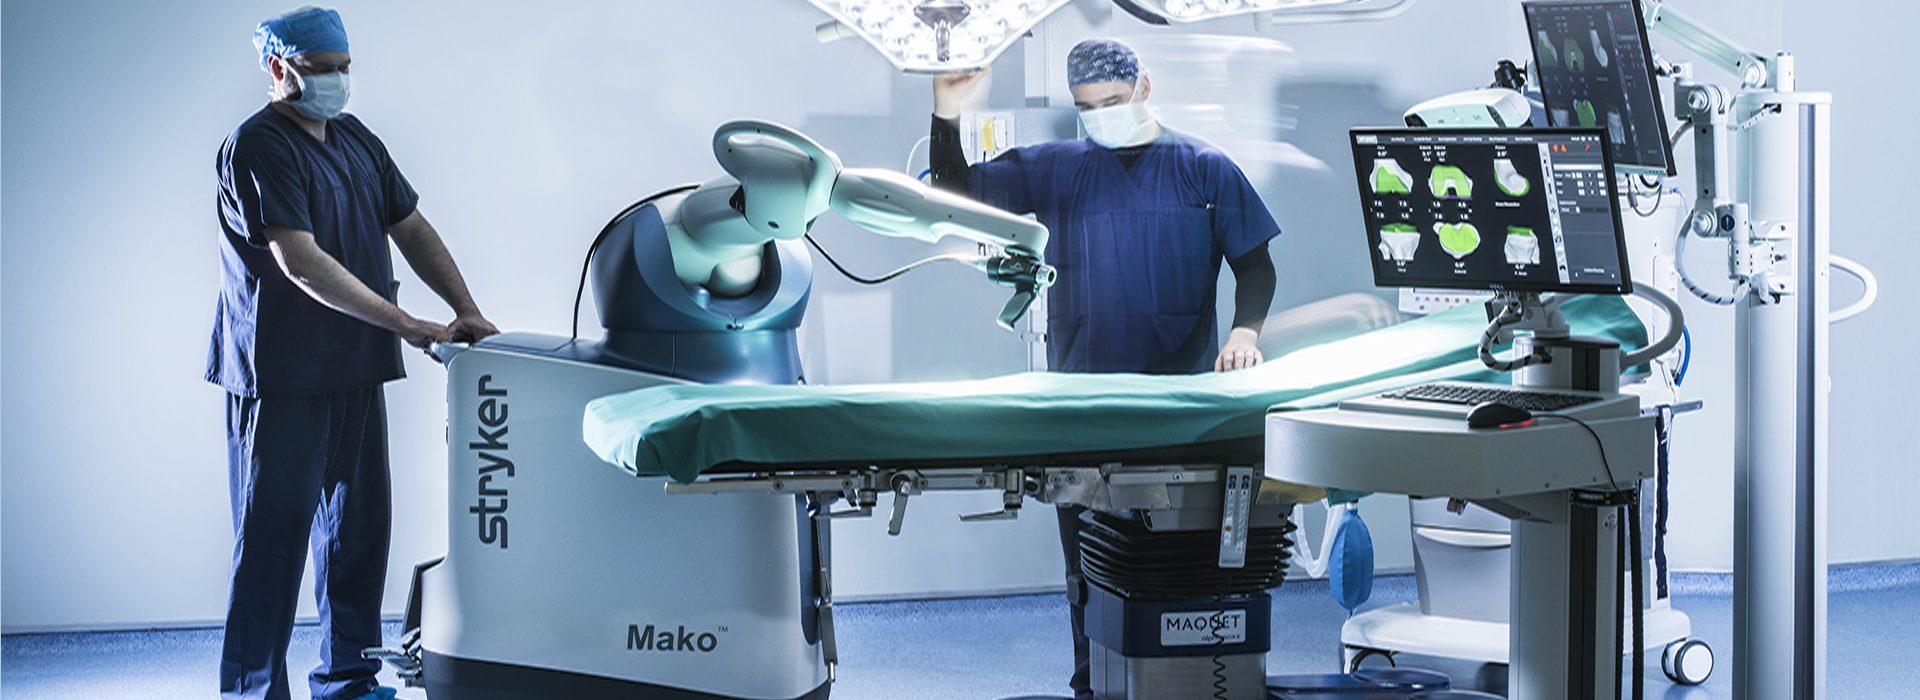 Mako Robotic Arm Assisted System Hygeia Hospital